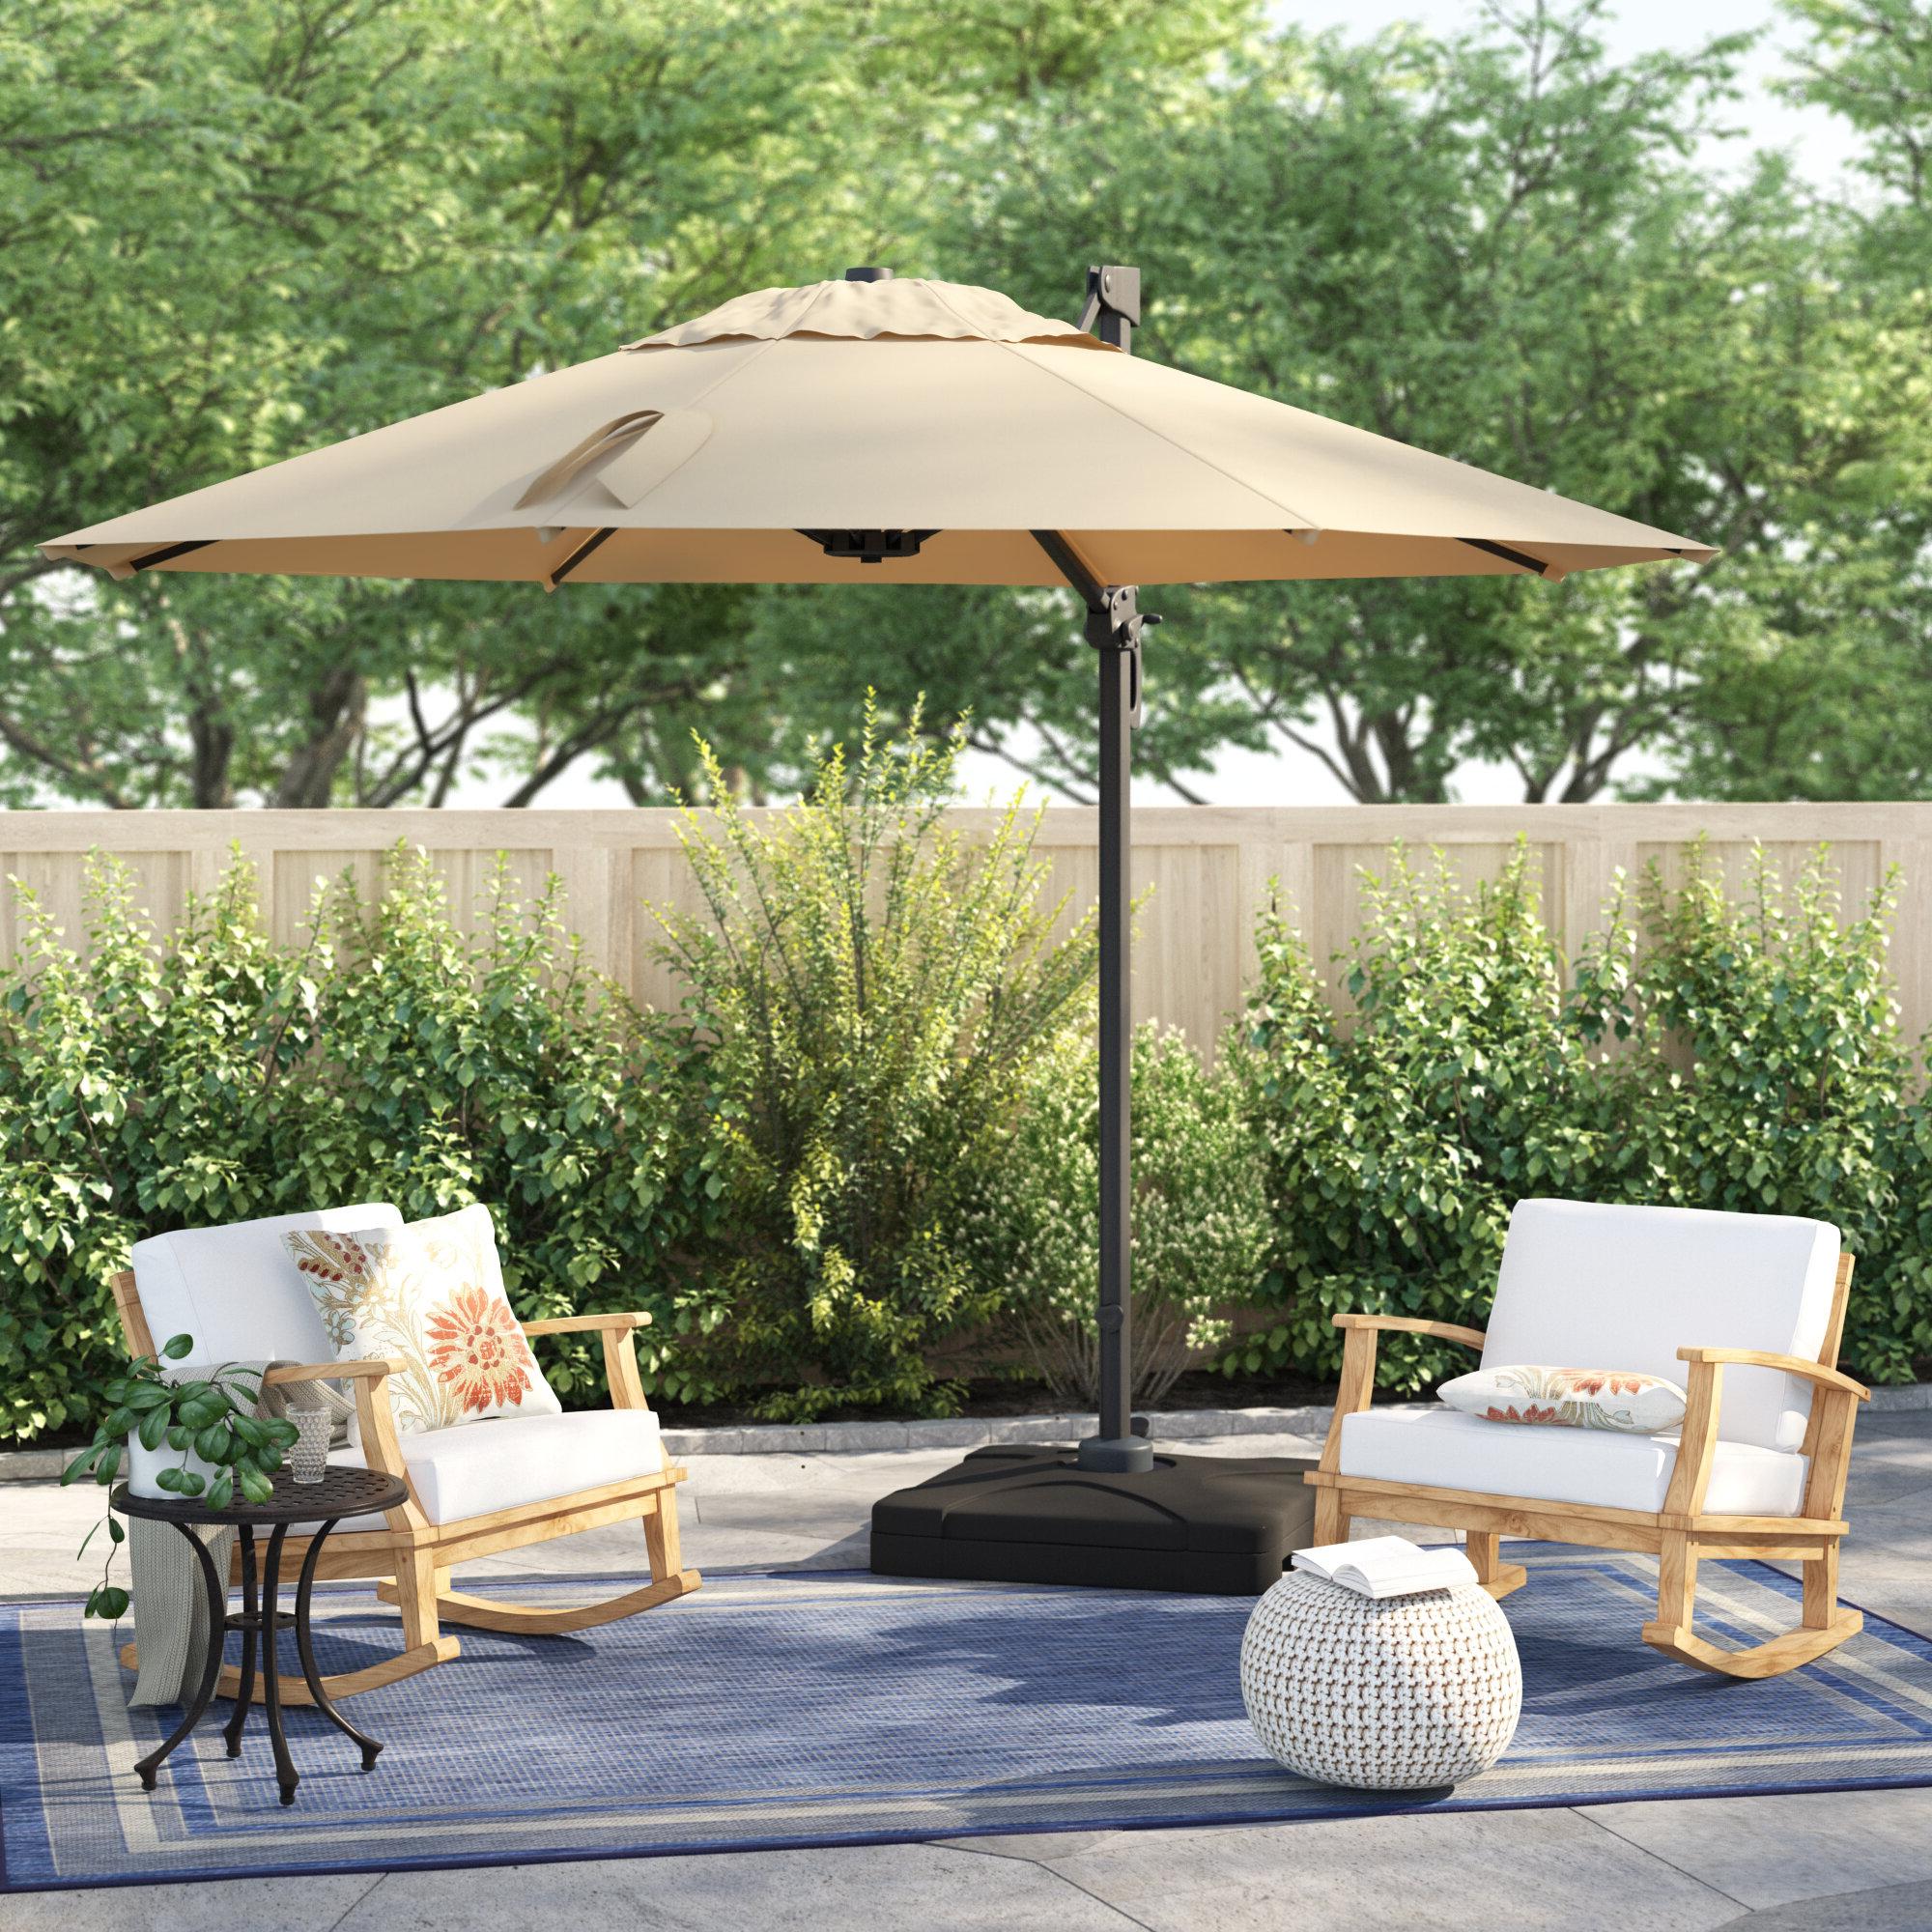 Karr Cantilever Umbrellas In 2019 Sol 72 Outdoor Bellana Cantilever Umbrella & Reviews (Gallery 7 of 20)